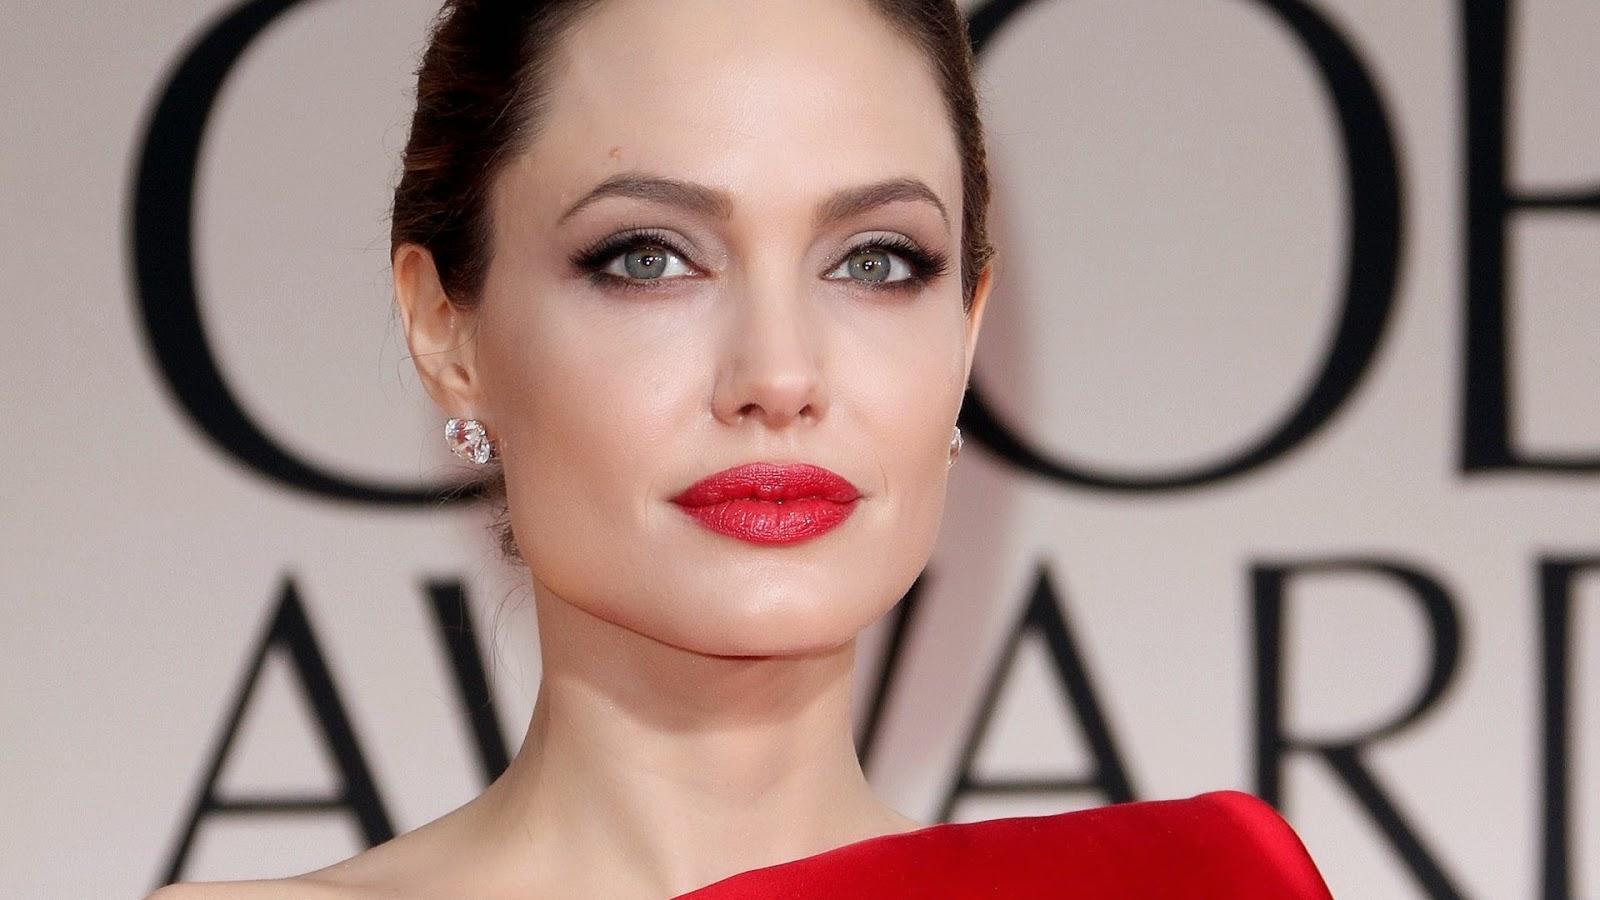 Angelina Jolie Hd Wallpapers: Film Stars World: Angelina Jolie HD Wallpaper 1080p